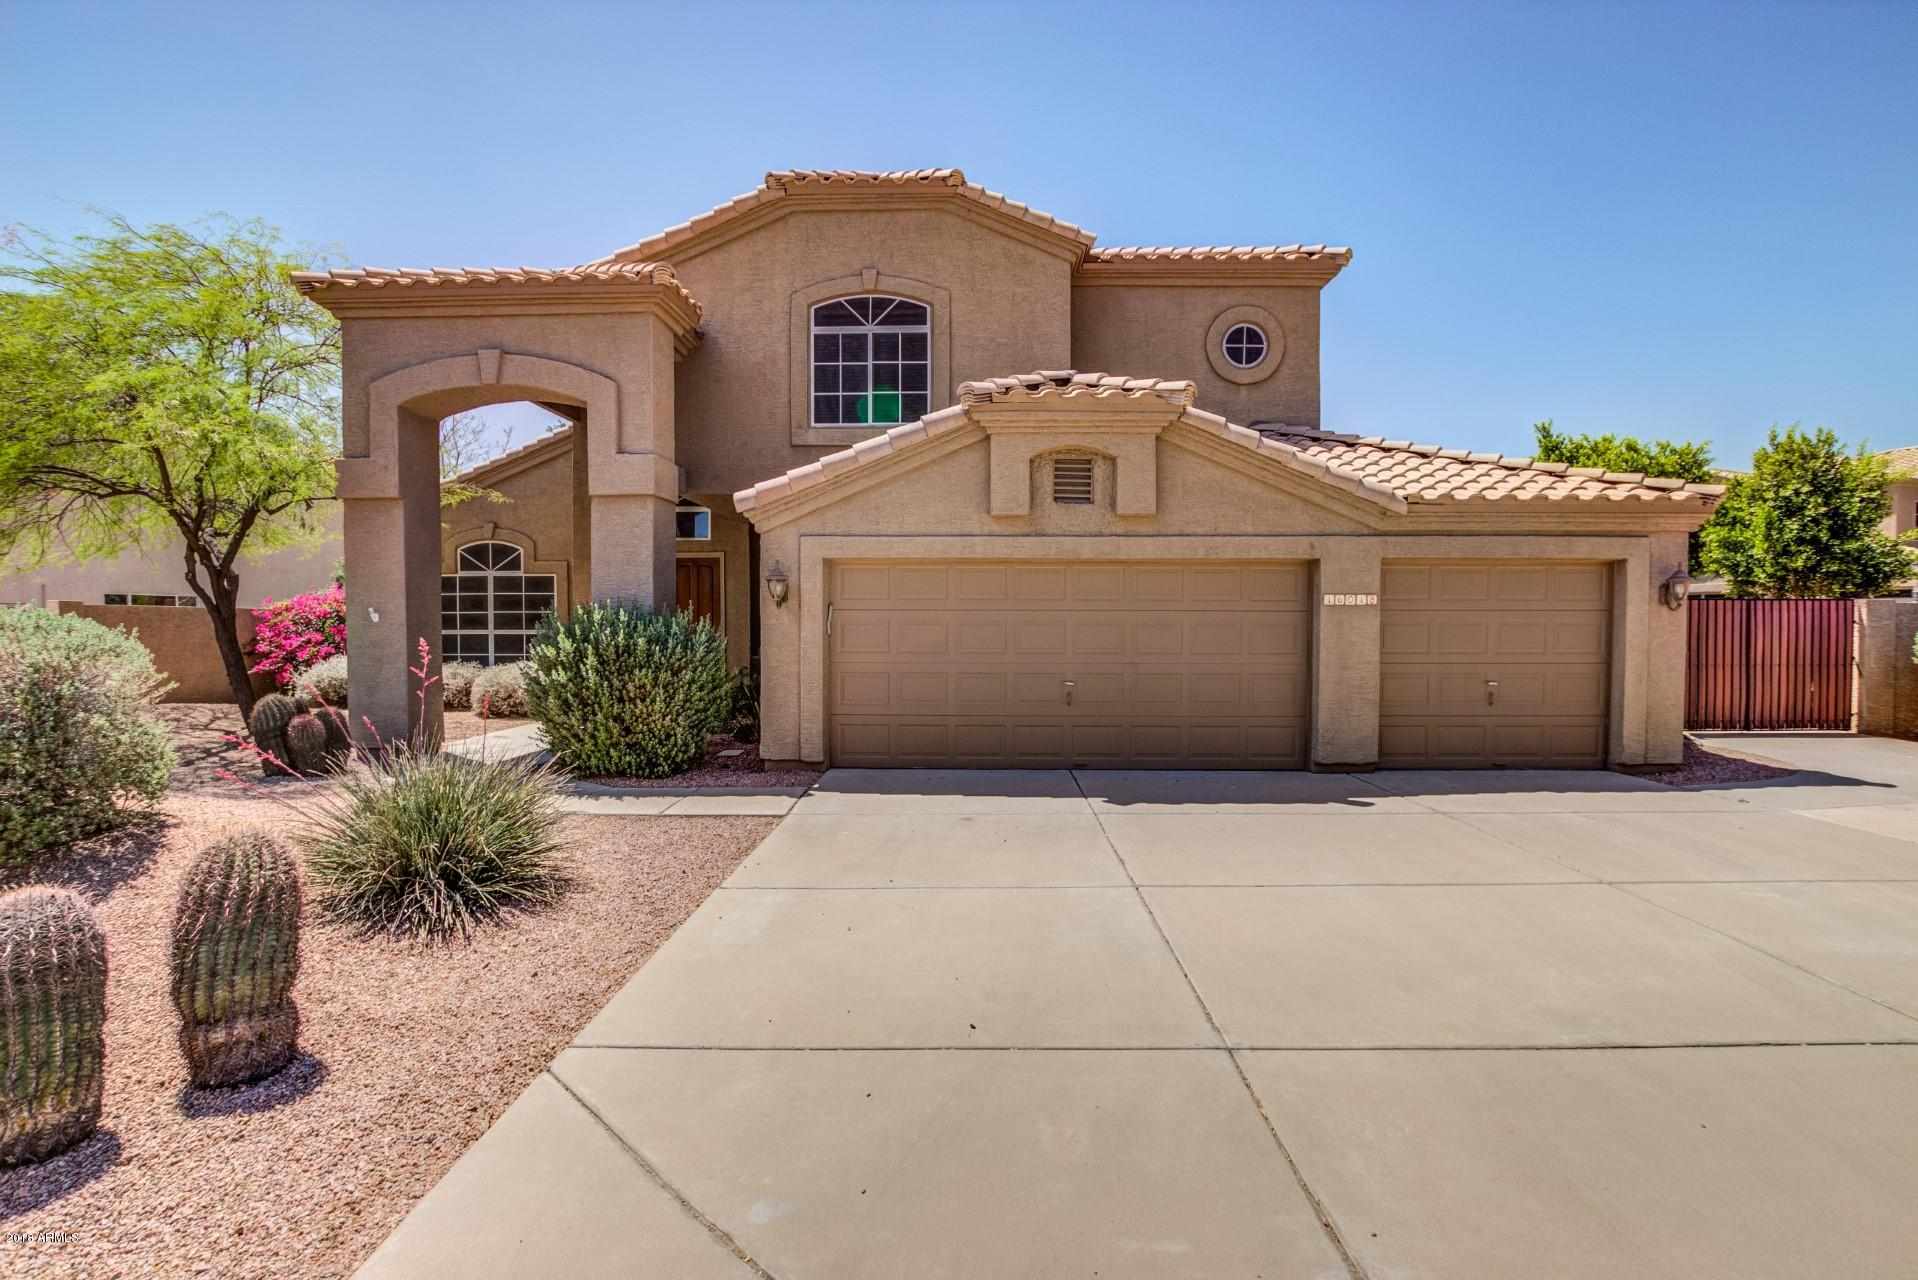 16018 S 7TH Drive Phoenix AZ 85045